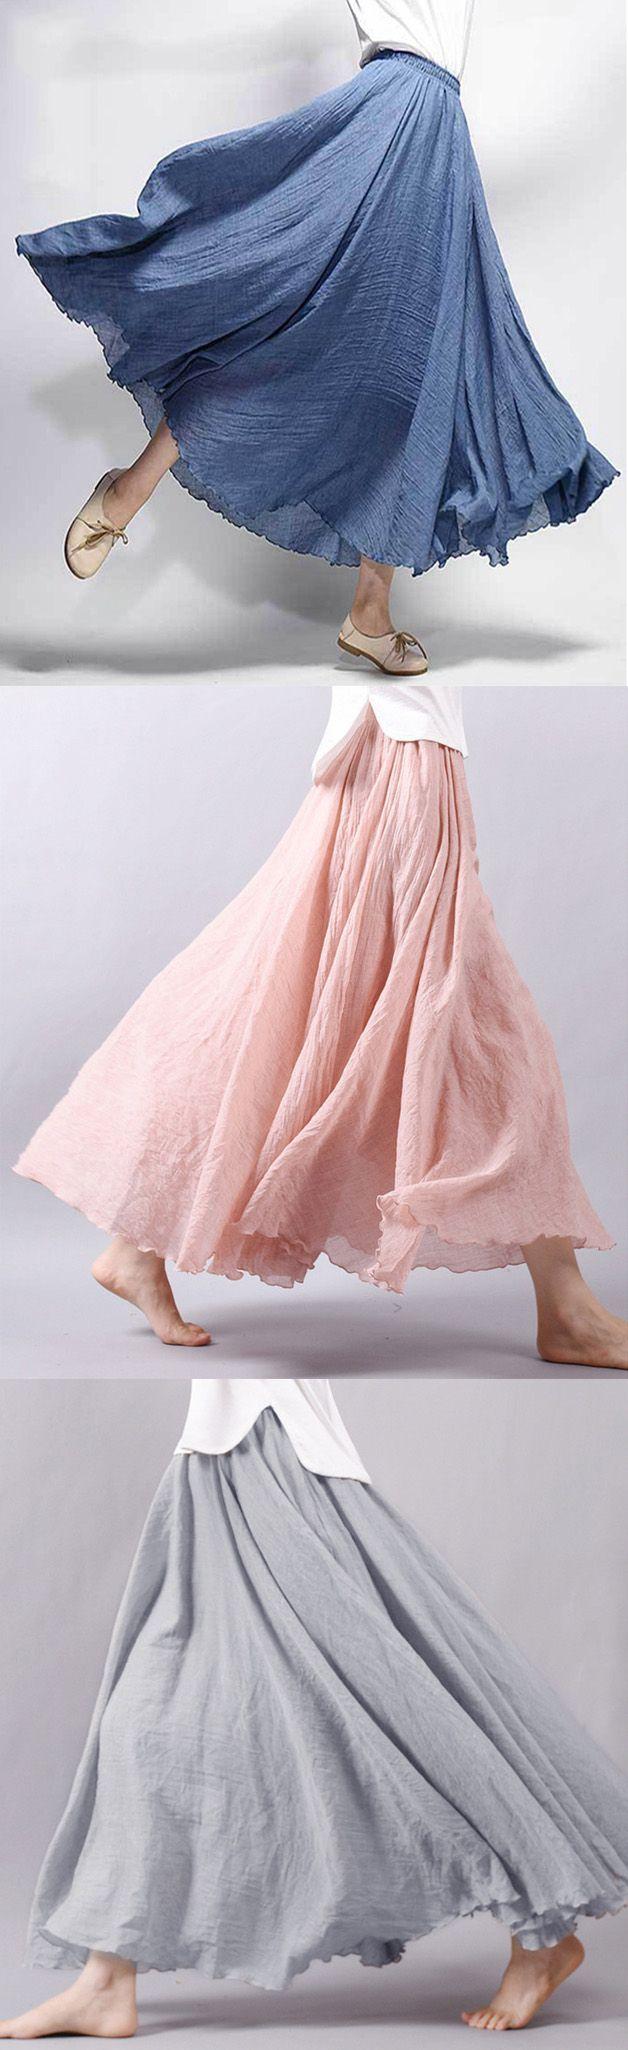 65 Best Fashion Images On Pinterest Casual Wear Apartments And Magnolia Criss Cross Stripe Camisole Wanita Putih Gracila Women Loose Cotton Pure Color Skirts Dresses